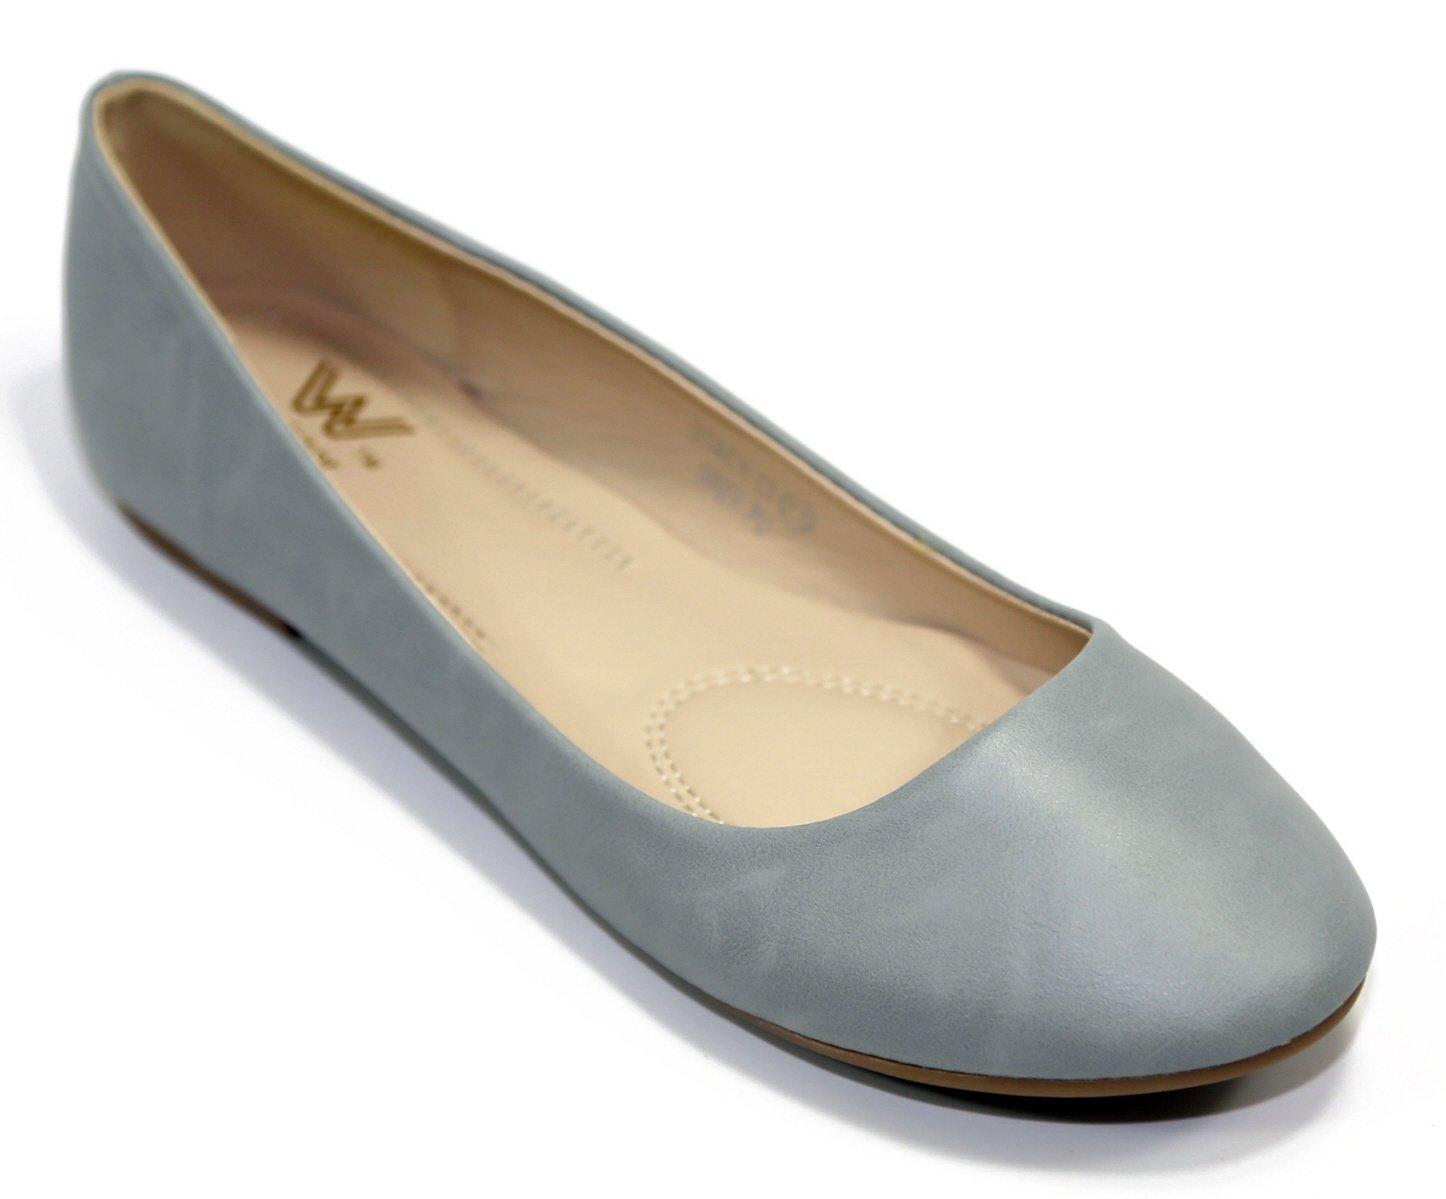 Walstar Women's Basic Round Toe Ballet Flat Shoes B015YJ6GP4 7 B (Run Small, Order 1/2 size UP)|Grey Pu